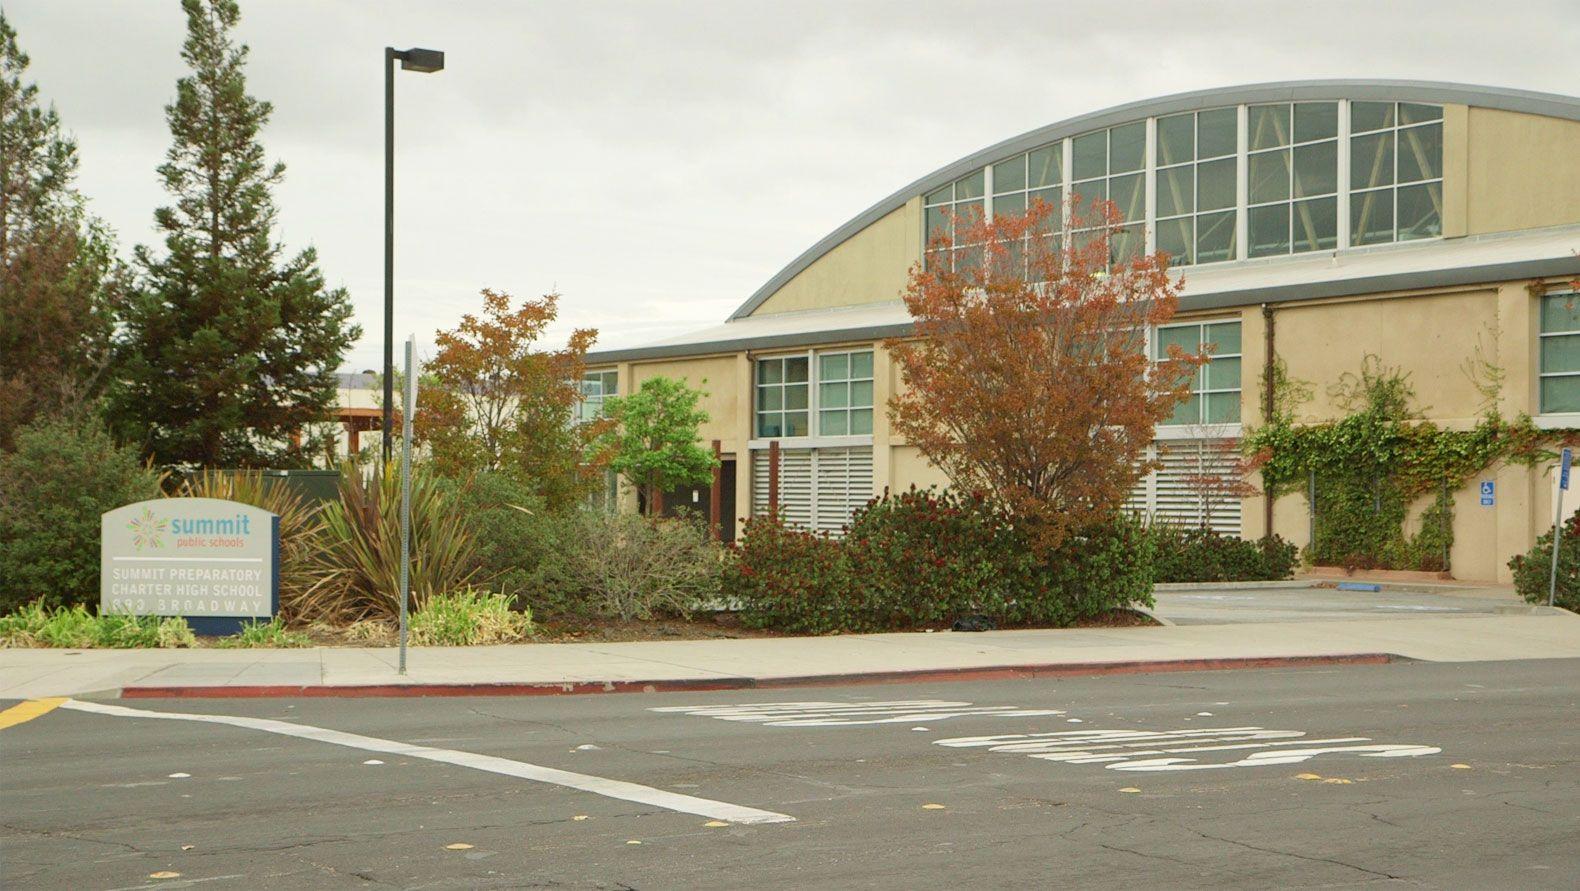 Summit Preparatory Charter High School